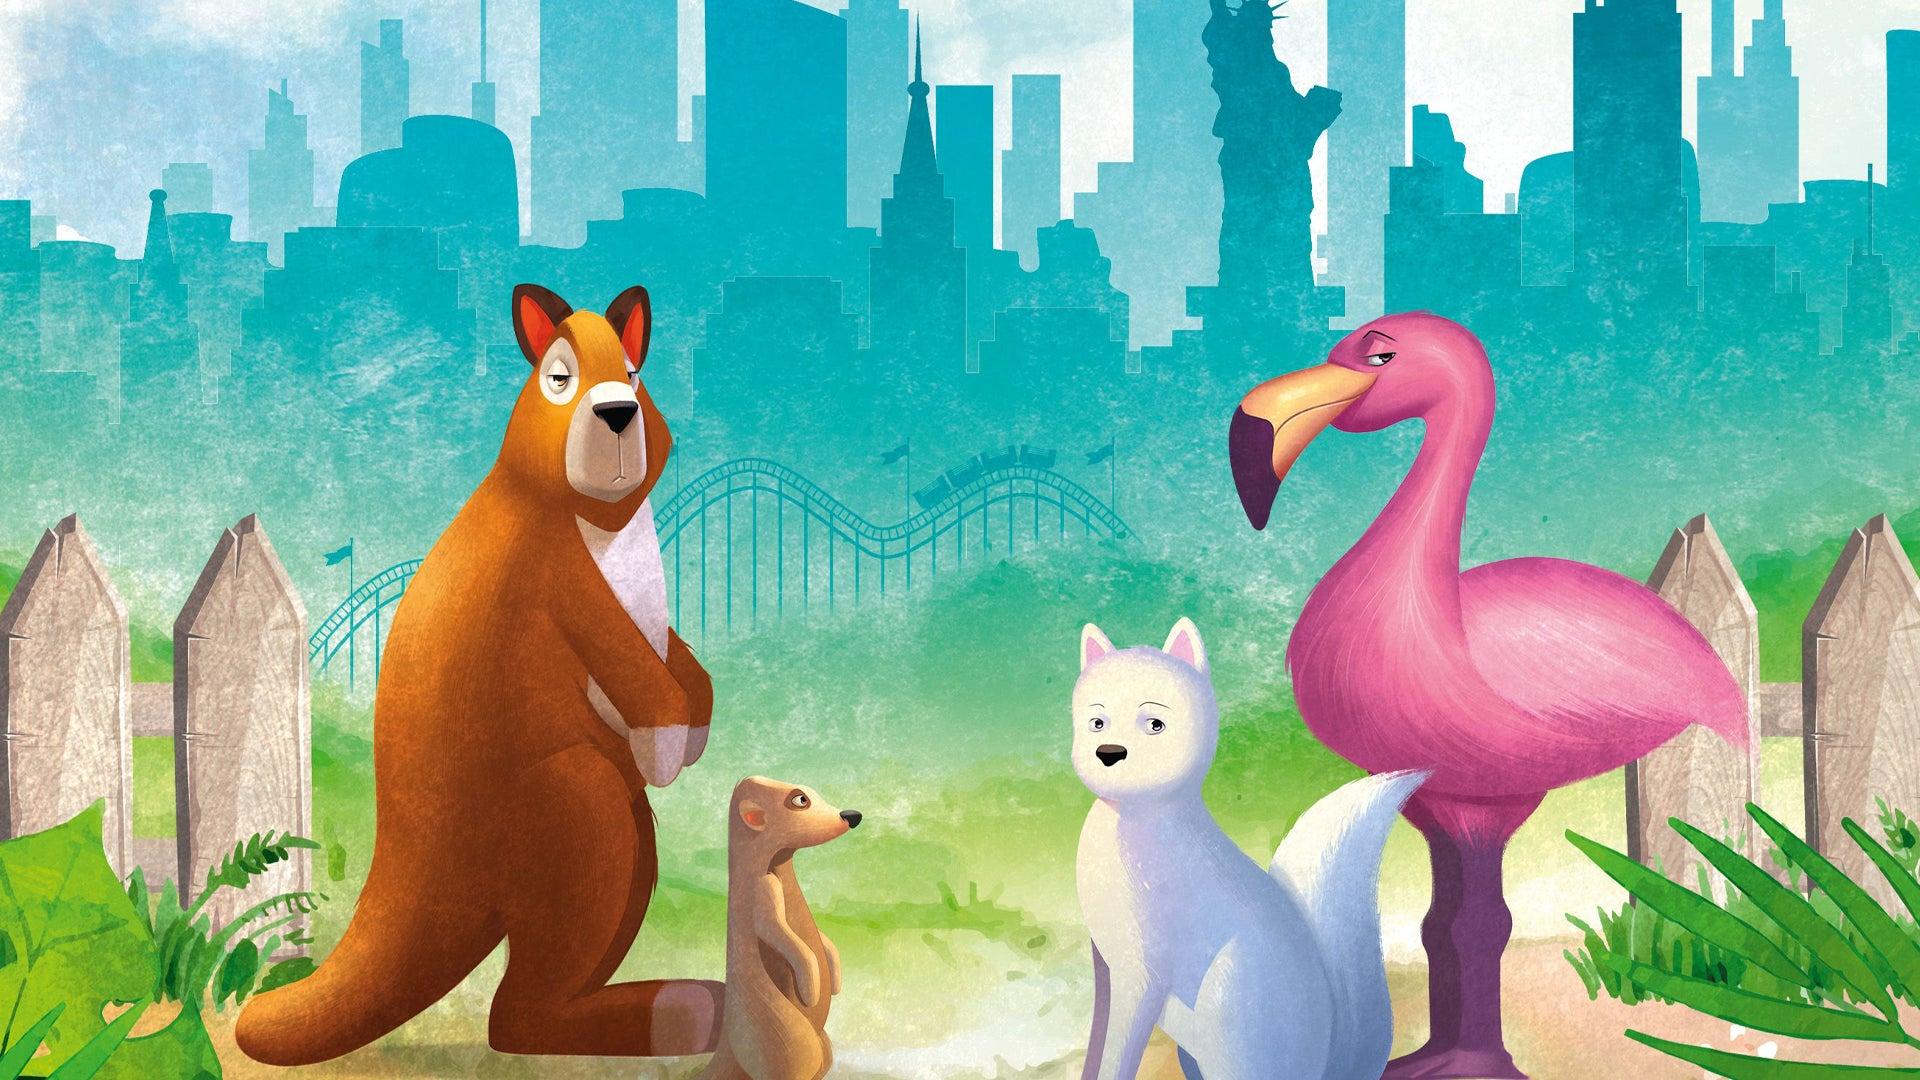 New York Zoo board game artwork